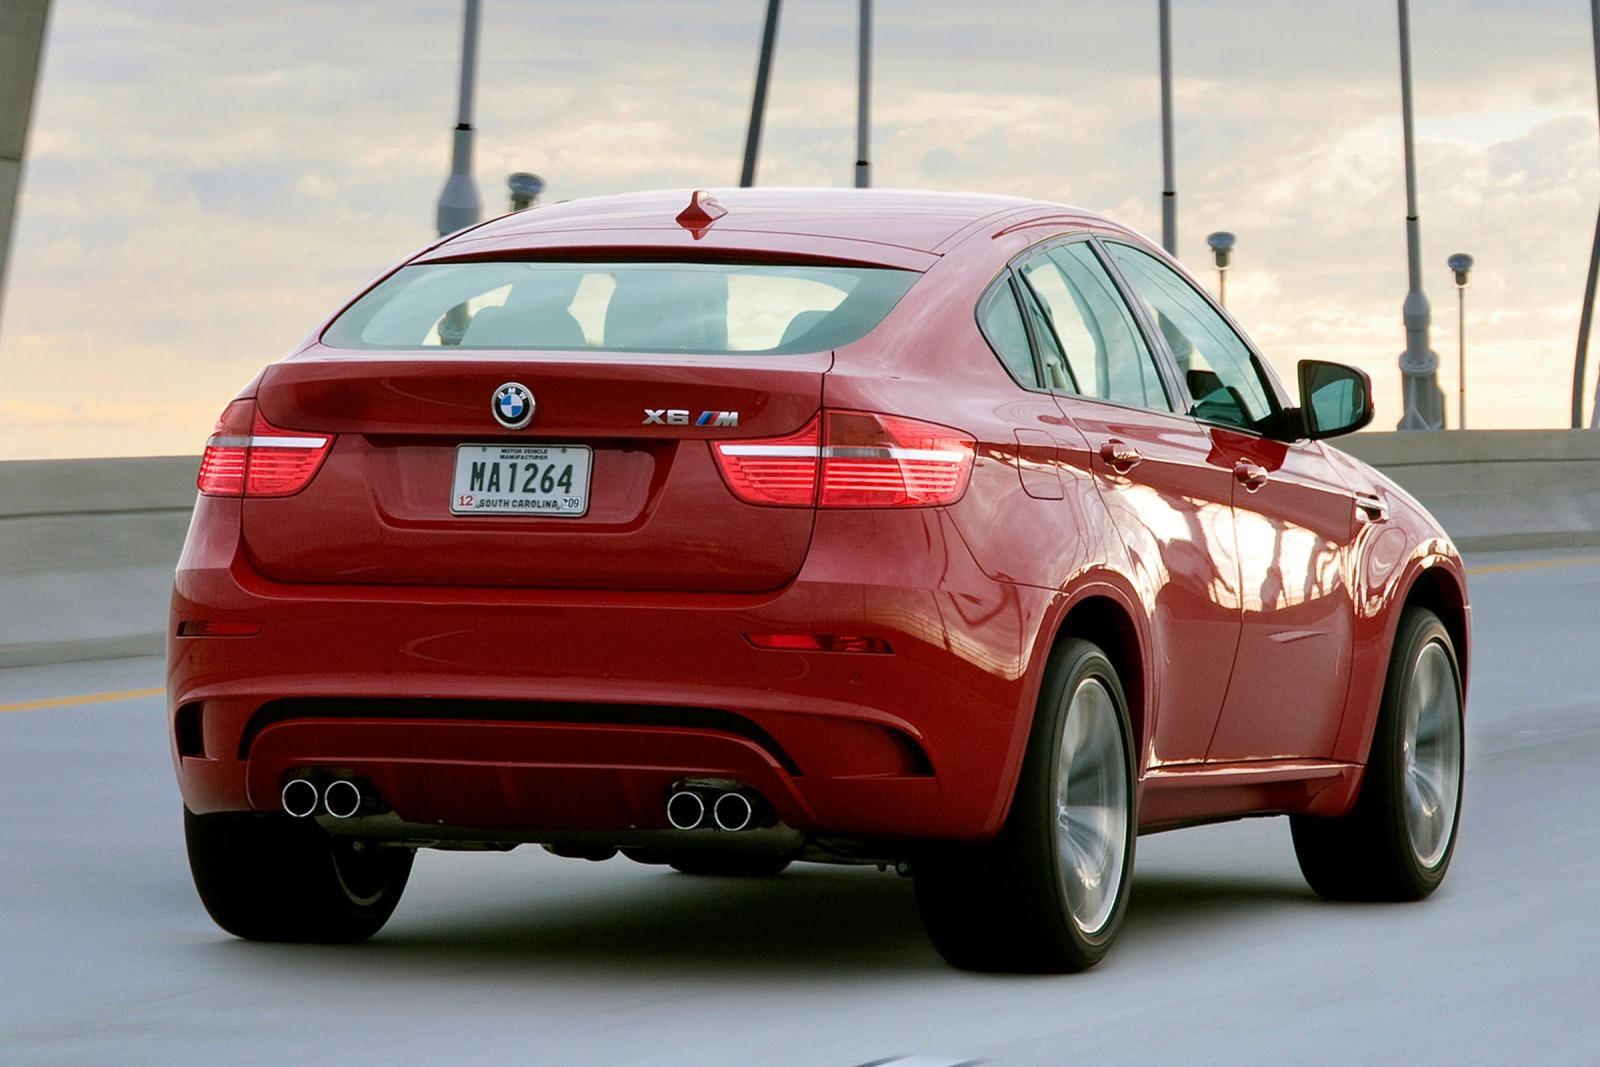 2011 BMW X6 M 4dr SUV Int Interior 6 800 1024 1280 1600 Origin